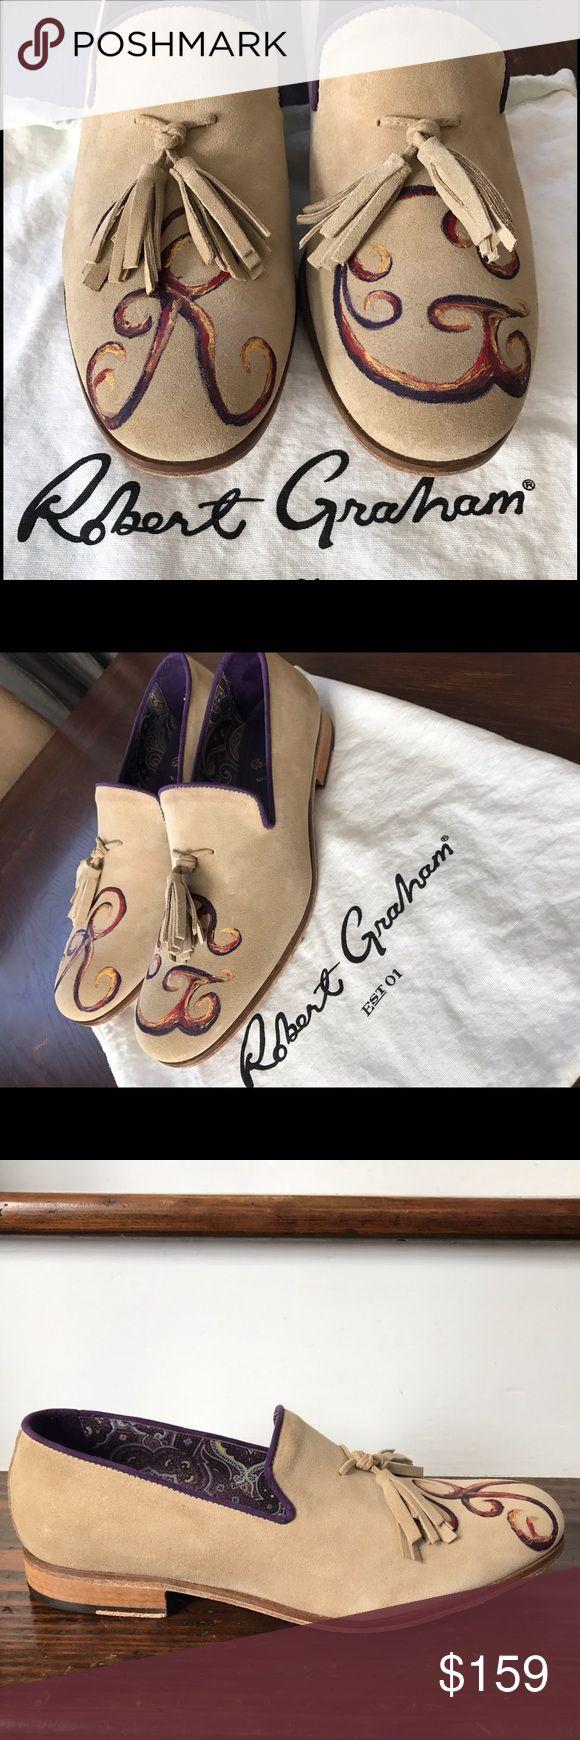 👞NEW ROBERT GRAHAM LOAFERS 👞 size 12 👞NEW ROBERT GRAHAM LOAFERS 👞 size 12 Robert Graham Shoes Loafers & Slip-Ons